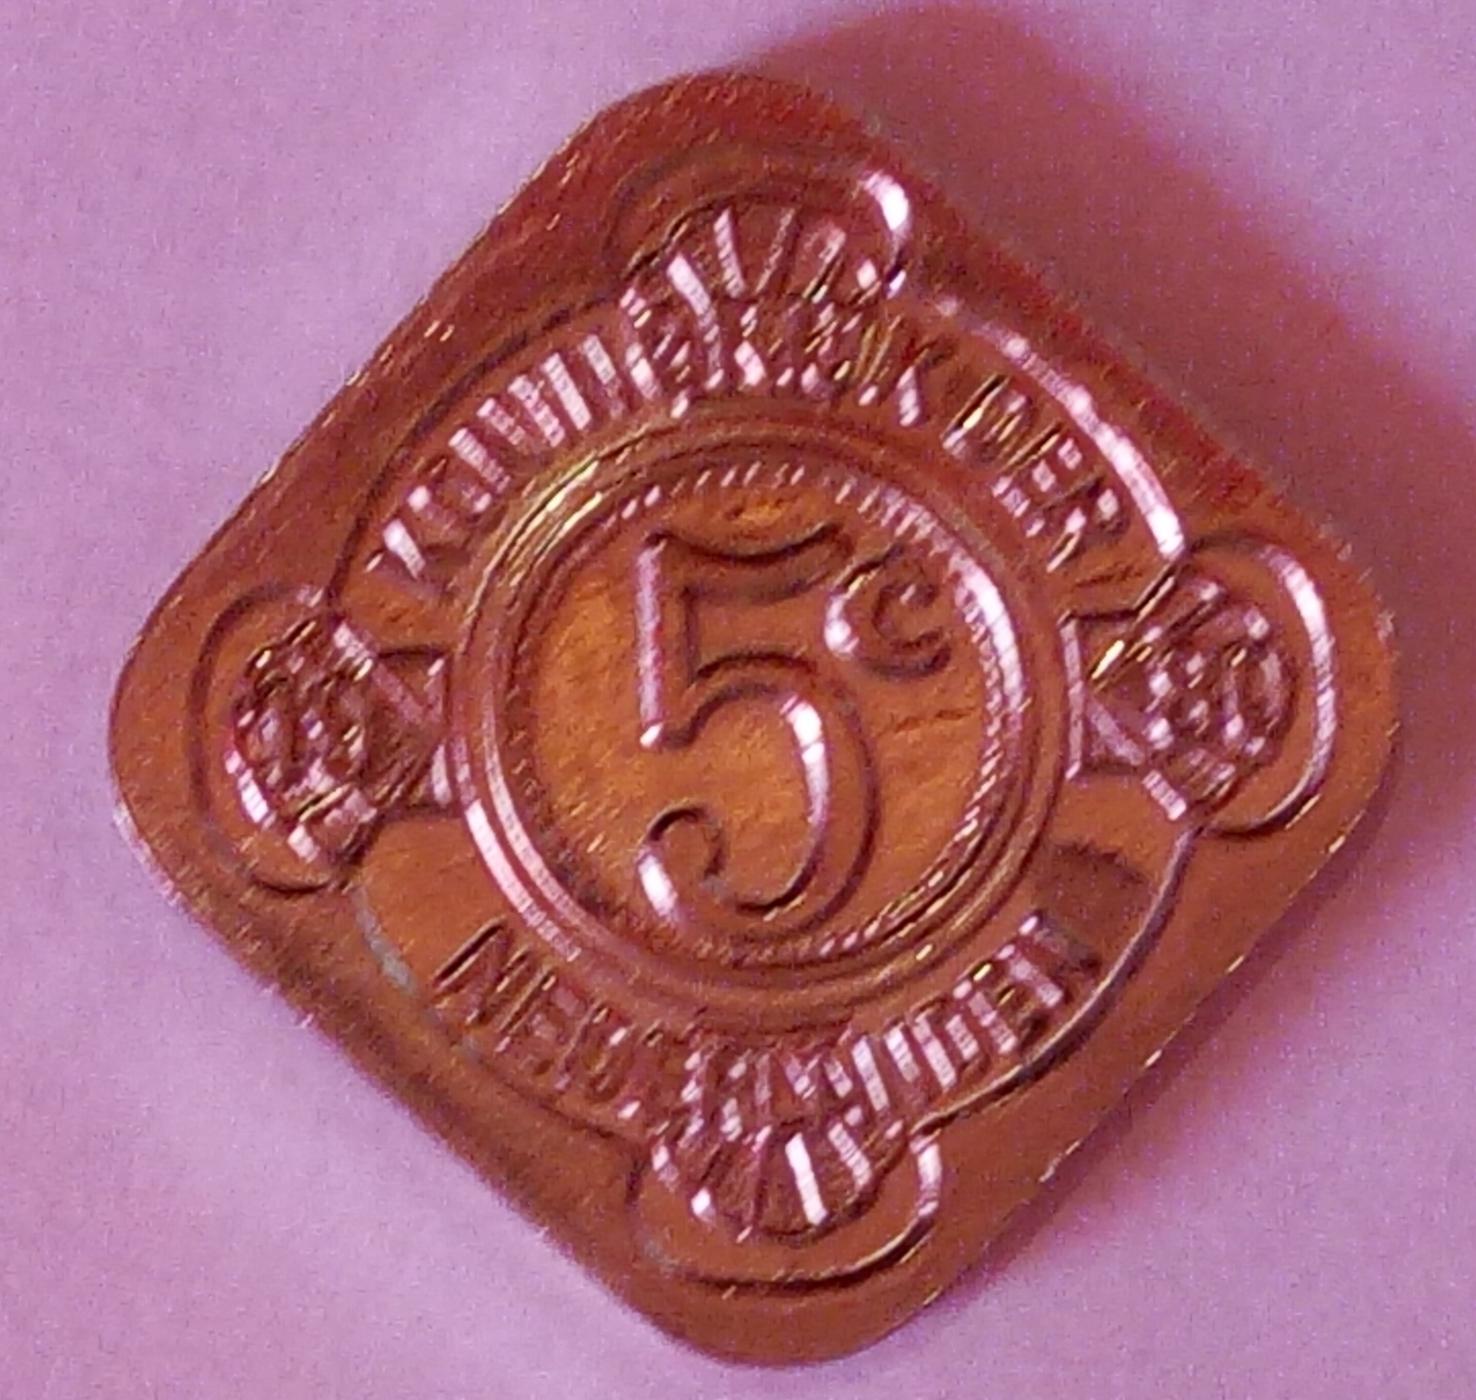 Fantasy Coinage Saint Eustatius Coins Set of 9 Pieces 2013